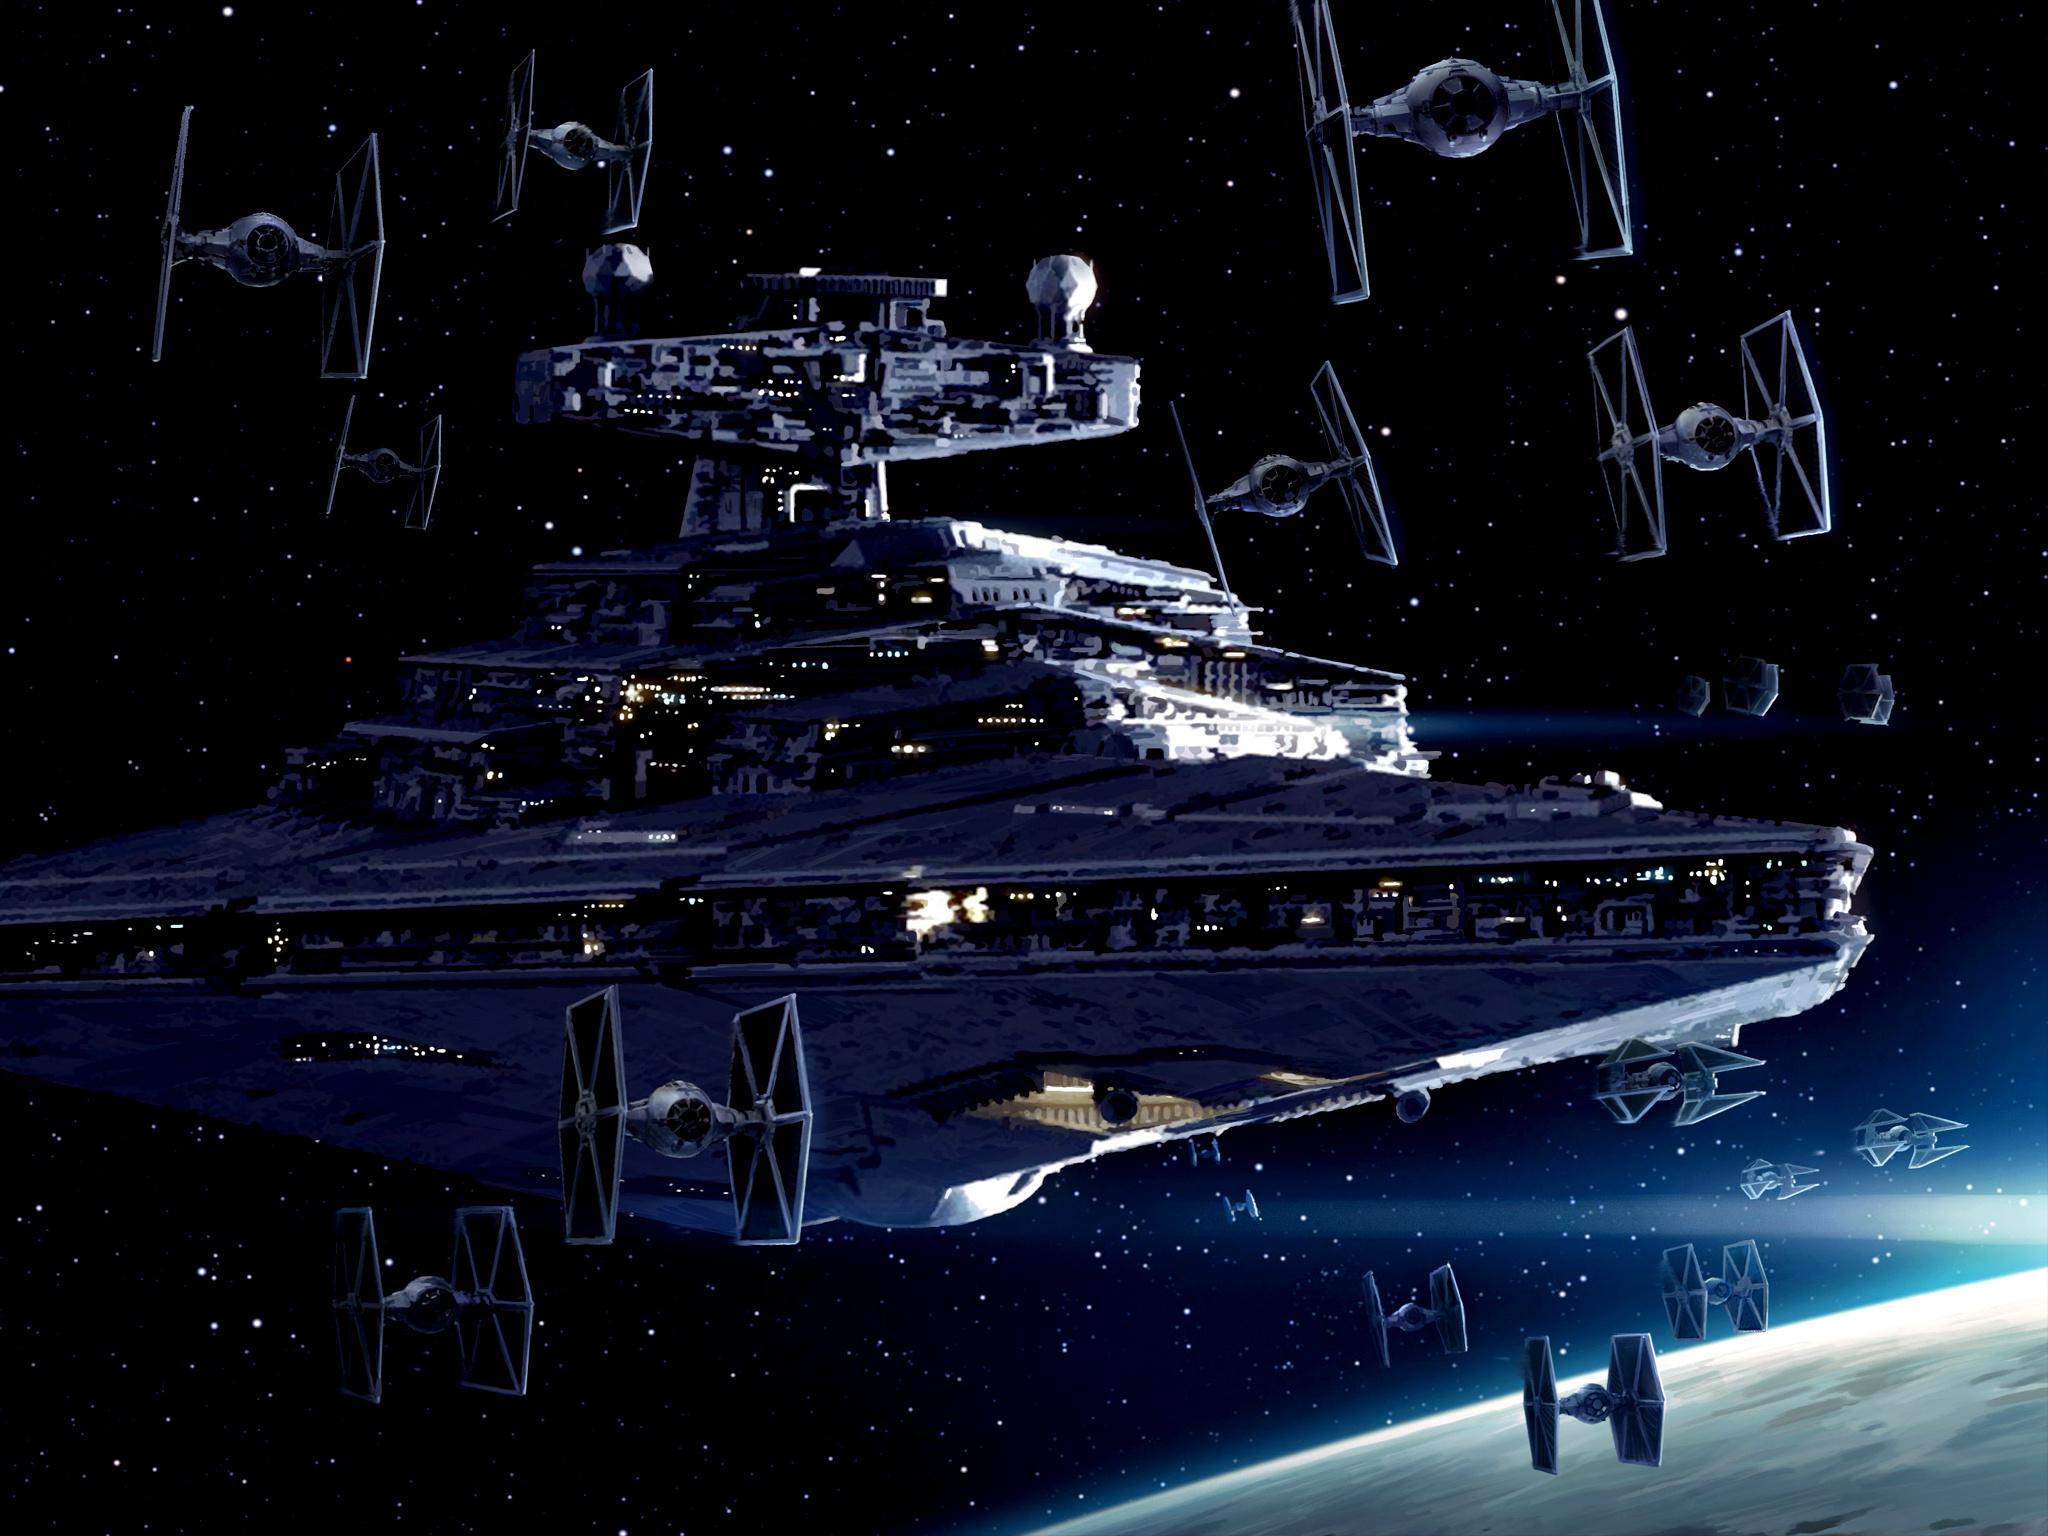 Free Download Destroyer Imperial Starfleet Star Destroyer Wars Spaceship Wallpaper 2048x1536 For Your Desktop Mobile Tablet Explore 49 Star Wars Star Destroyer Wallpaper Star Wars Imperial Wallpaper Star Wars